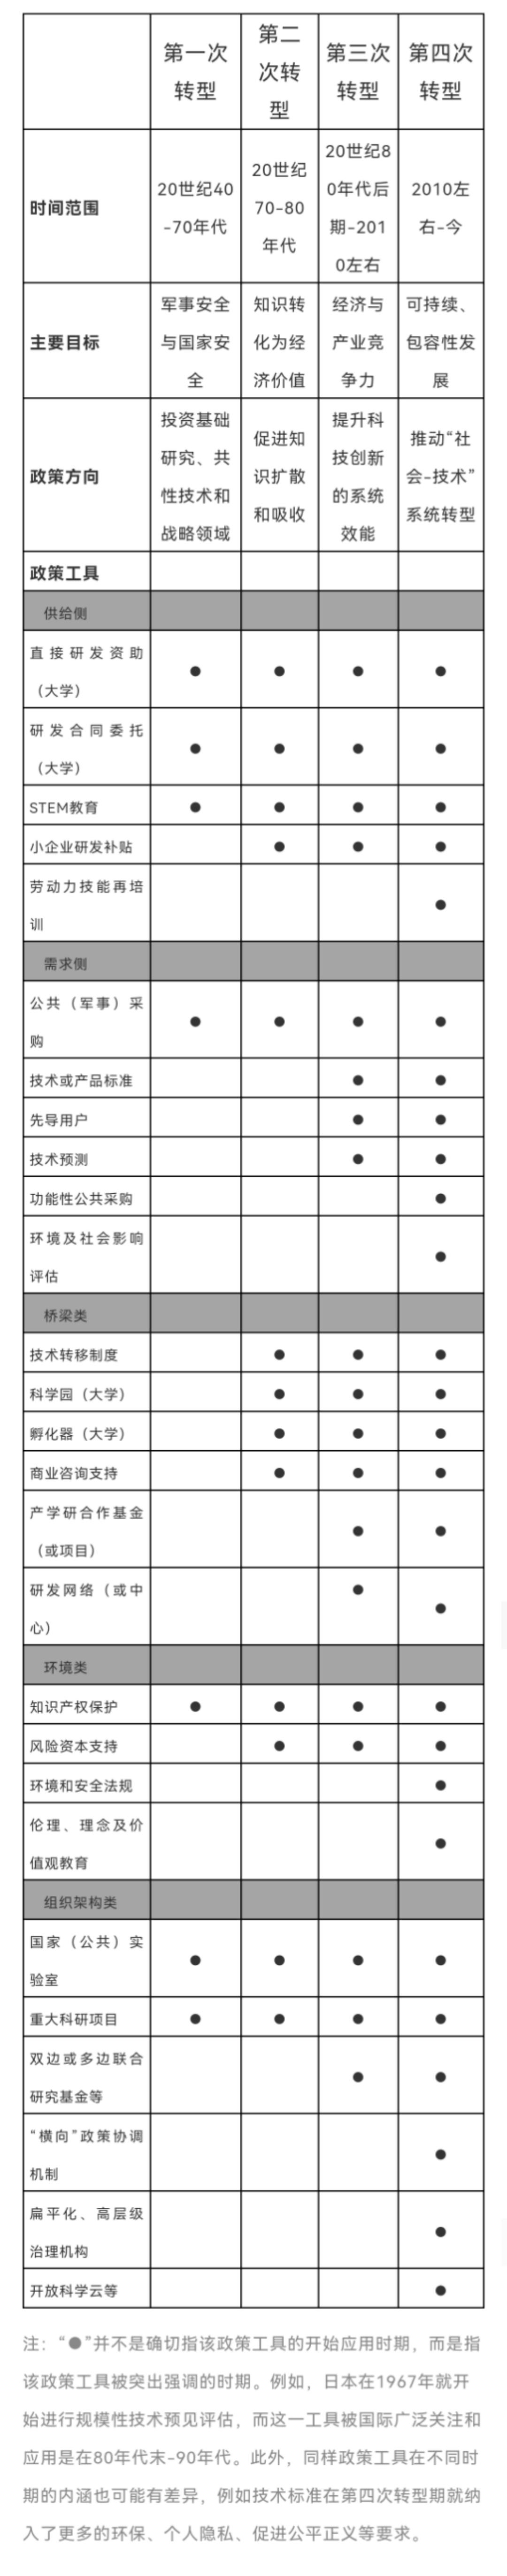 https://p5.itc.cn/q_70/images03/20210709/be9baa0c723c424eb341002f0b8f1090.png